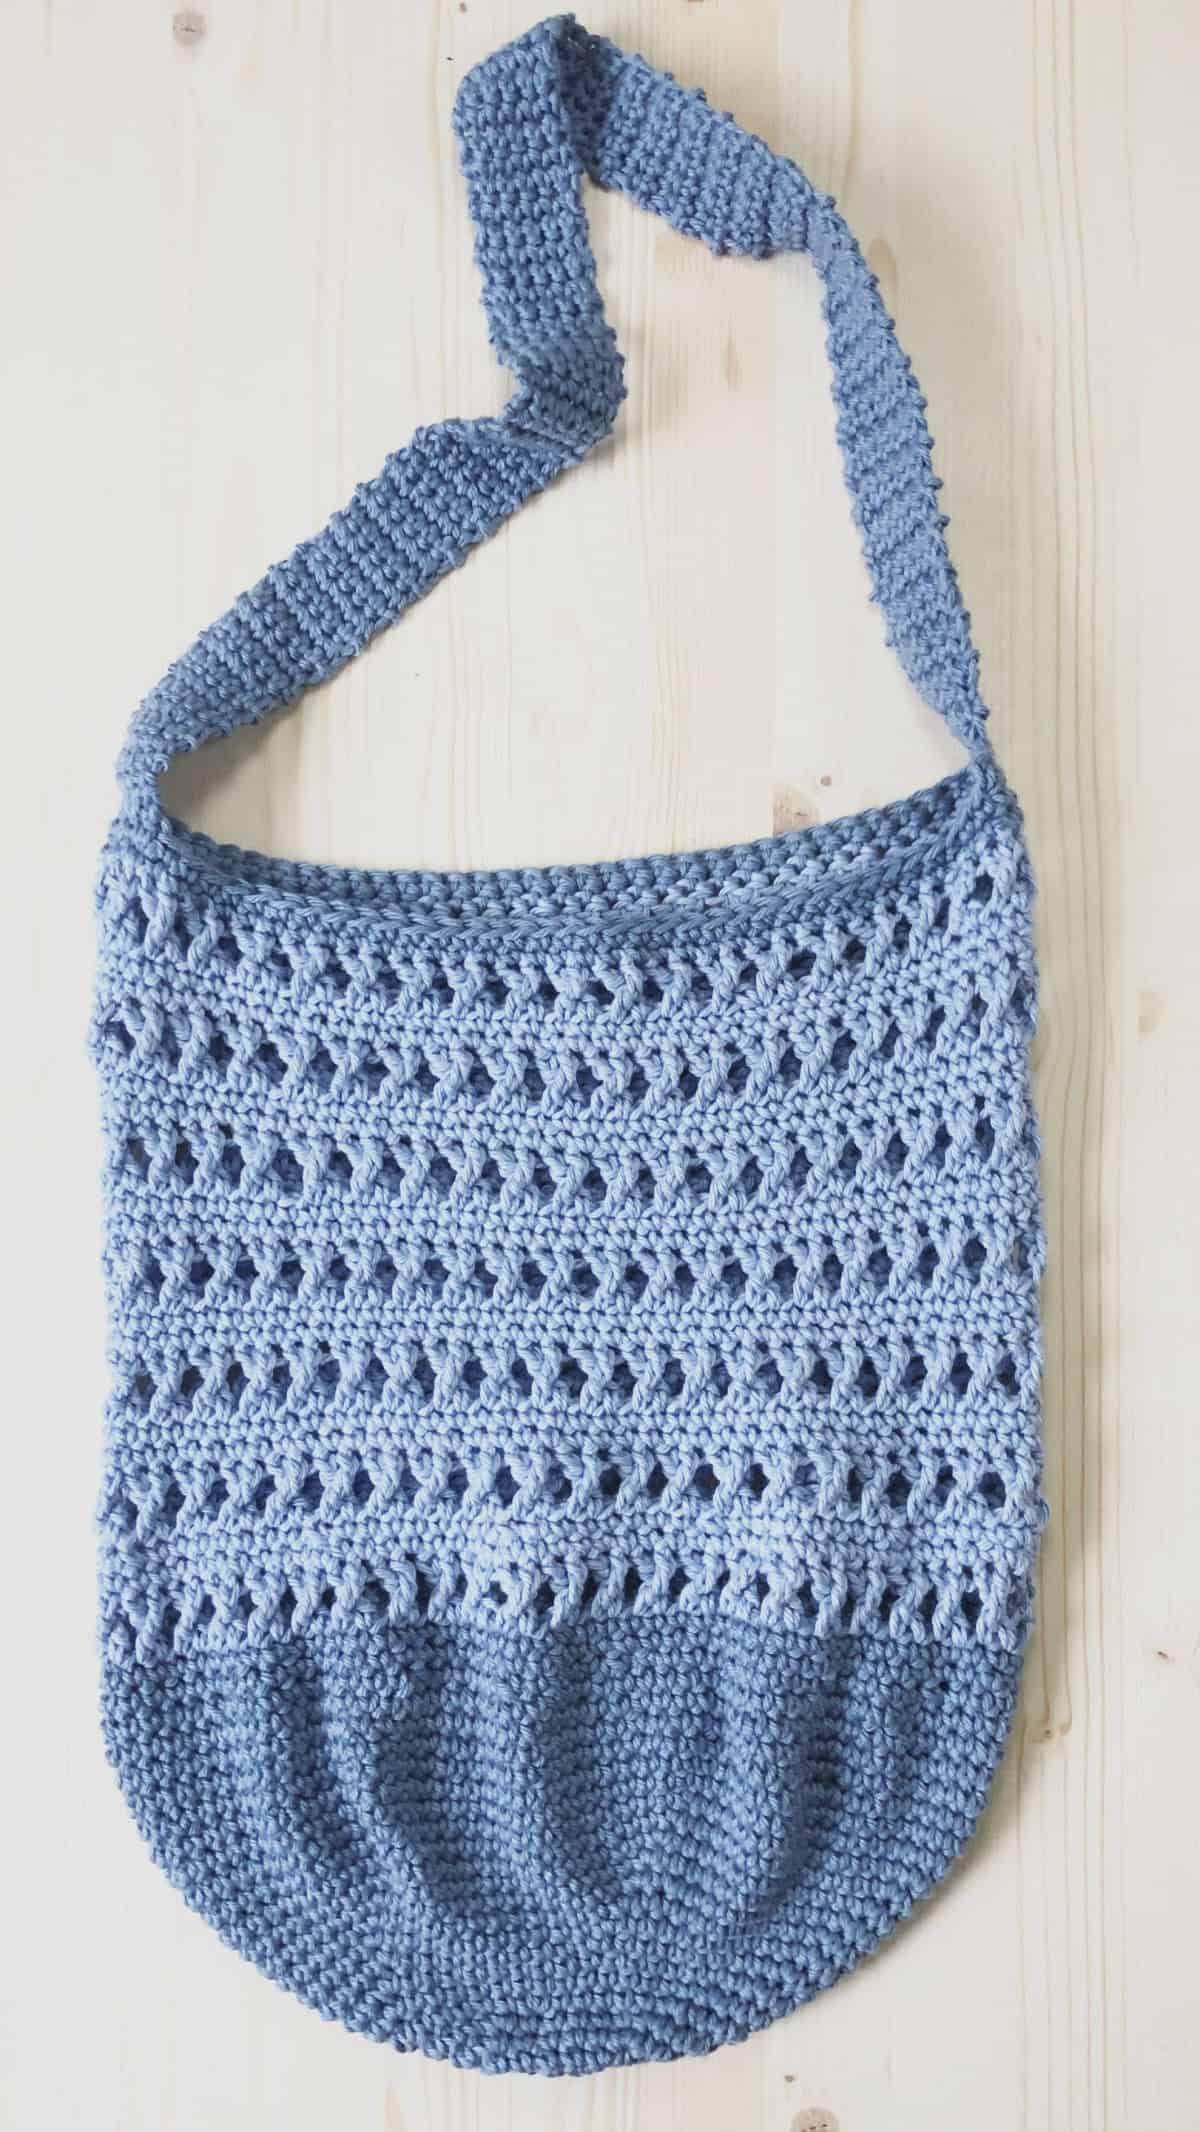 picture of blue crochet shoulder bag laid flat